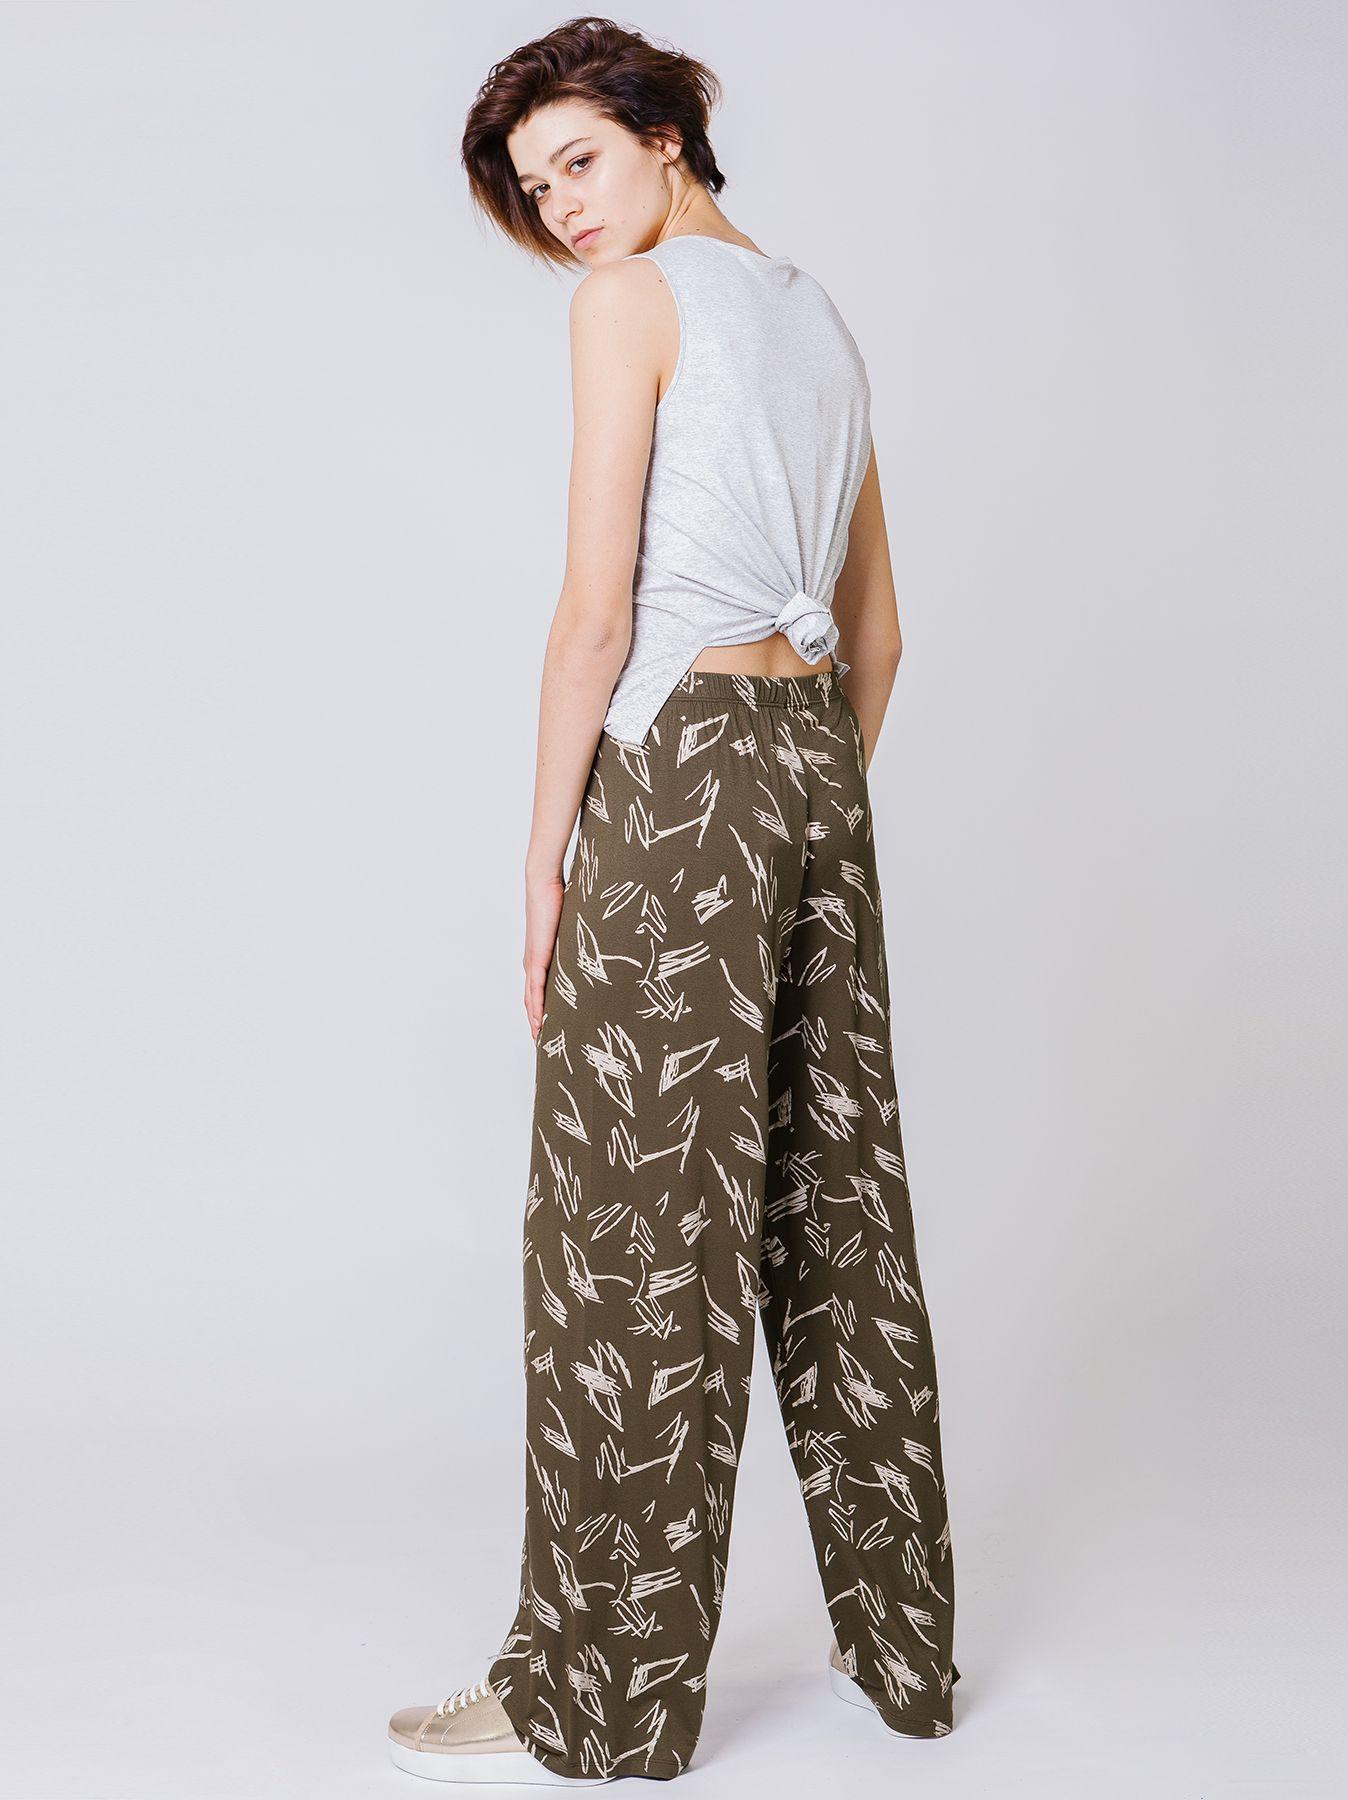 Pantalone elastico stampa Sketch